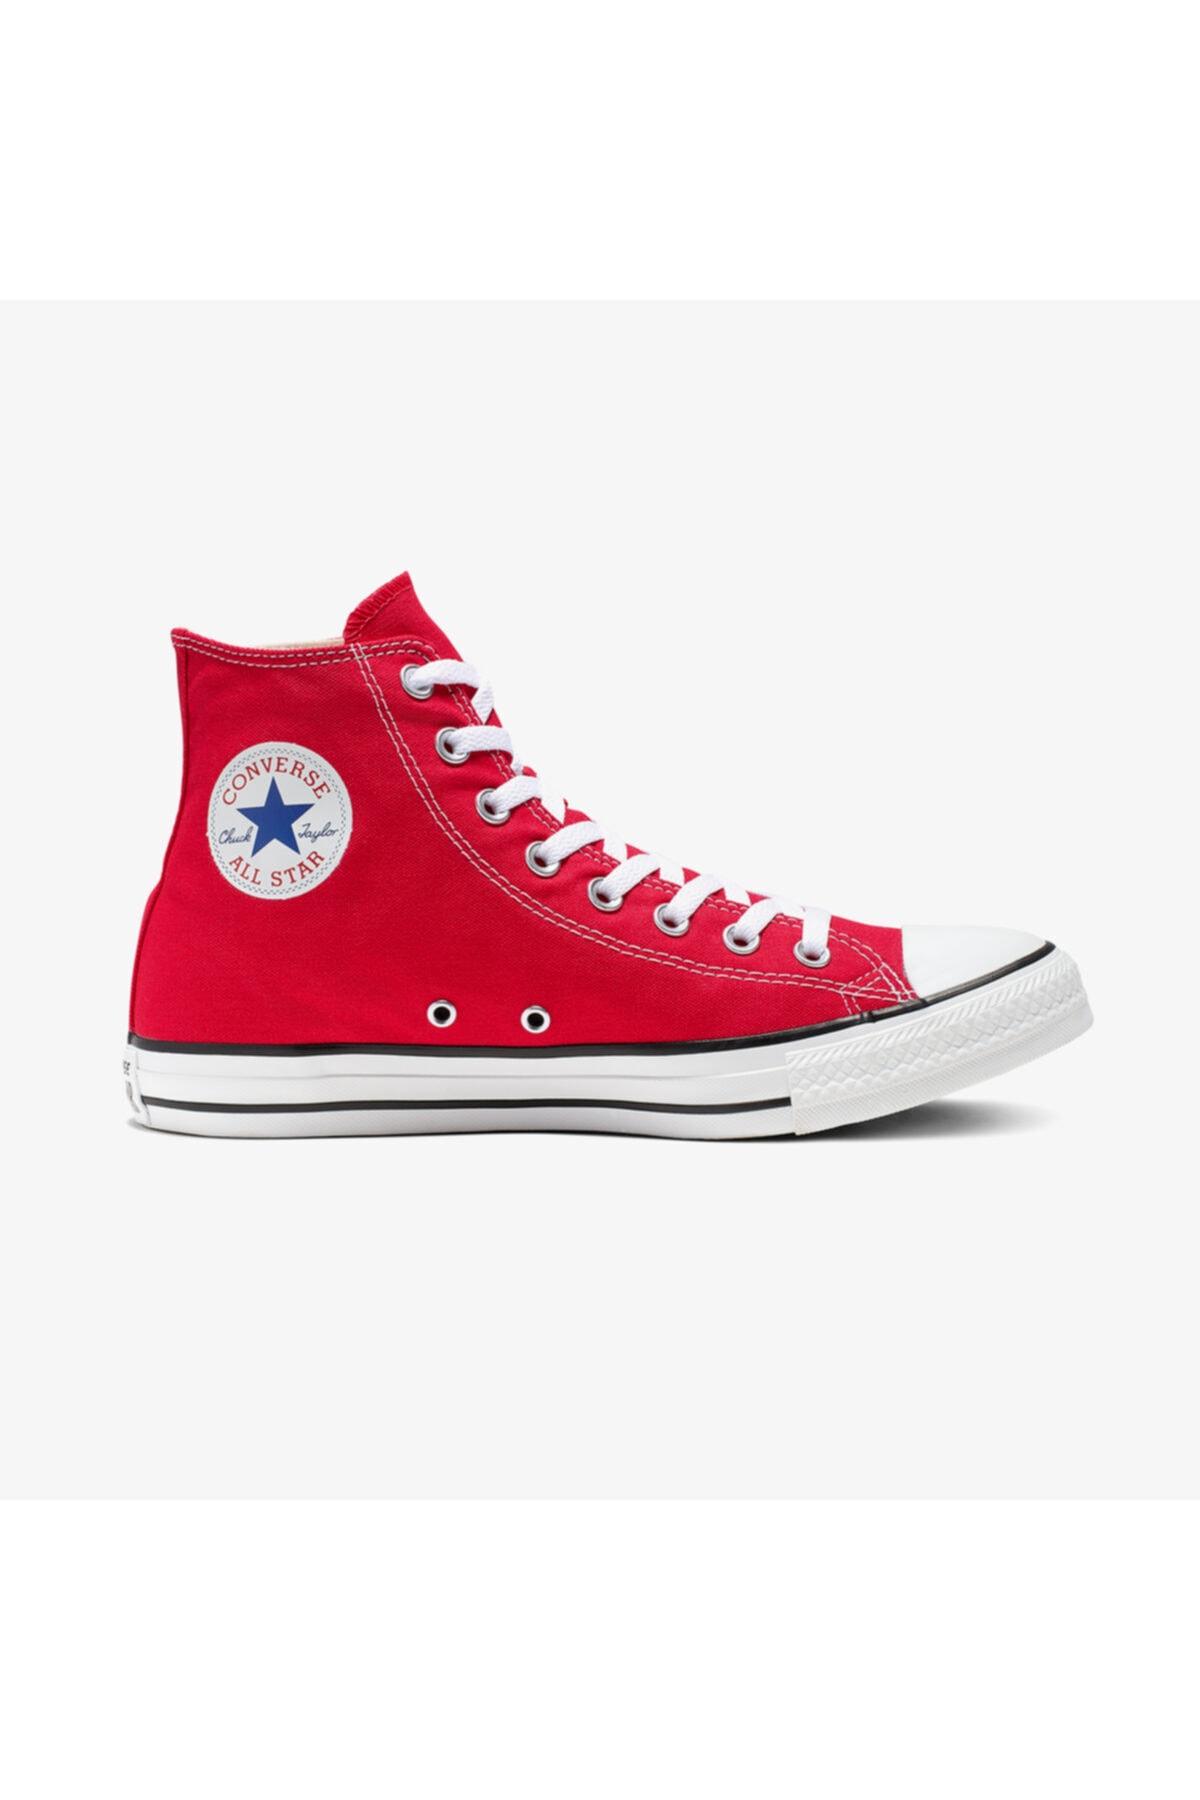 converse Unisex Kırmızı Chuck Taylor All Star Hi Sneaker Ayakkabı 1